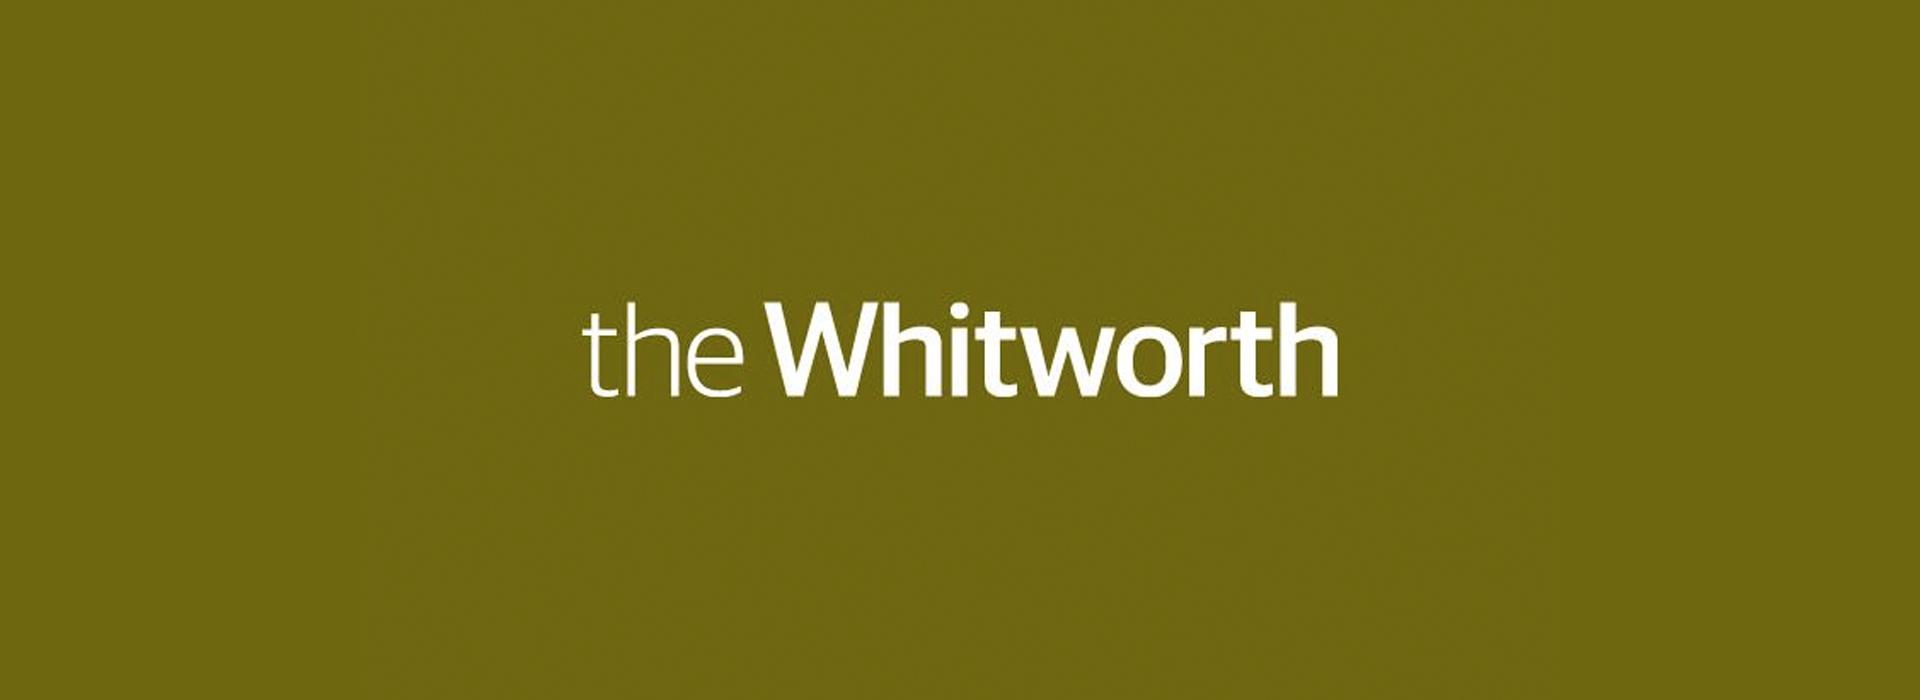 The Whitworth